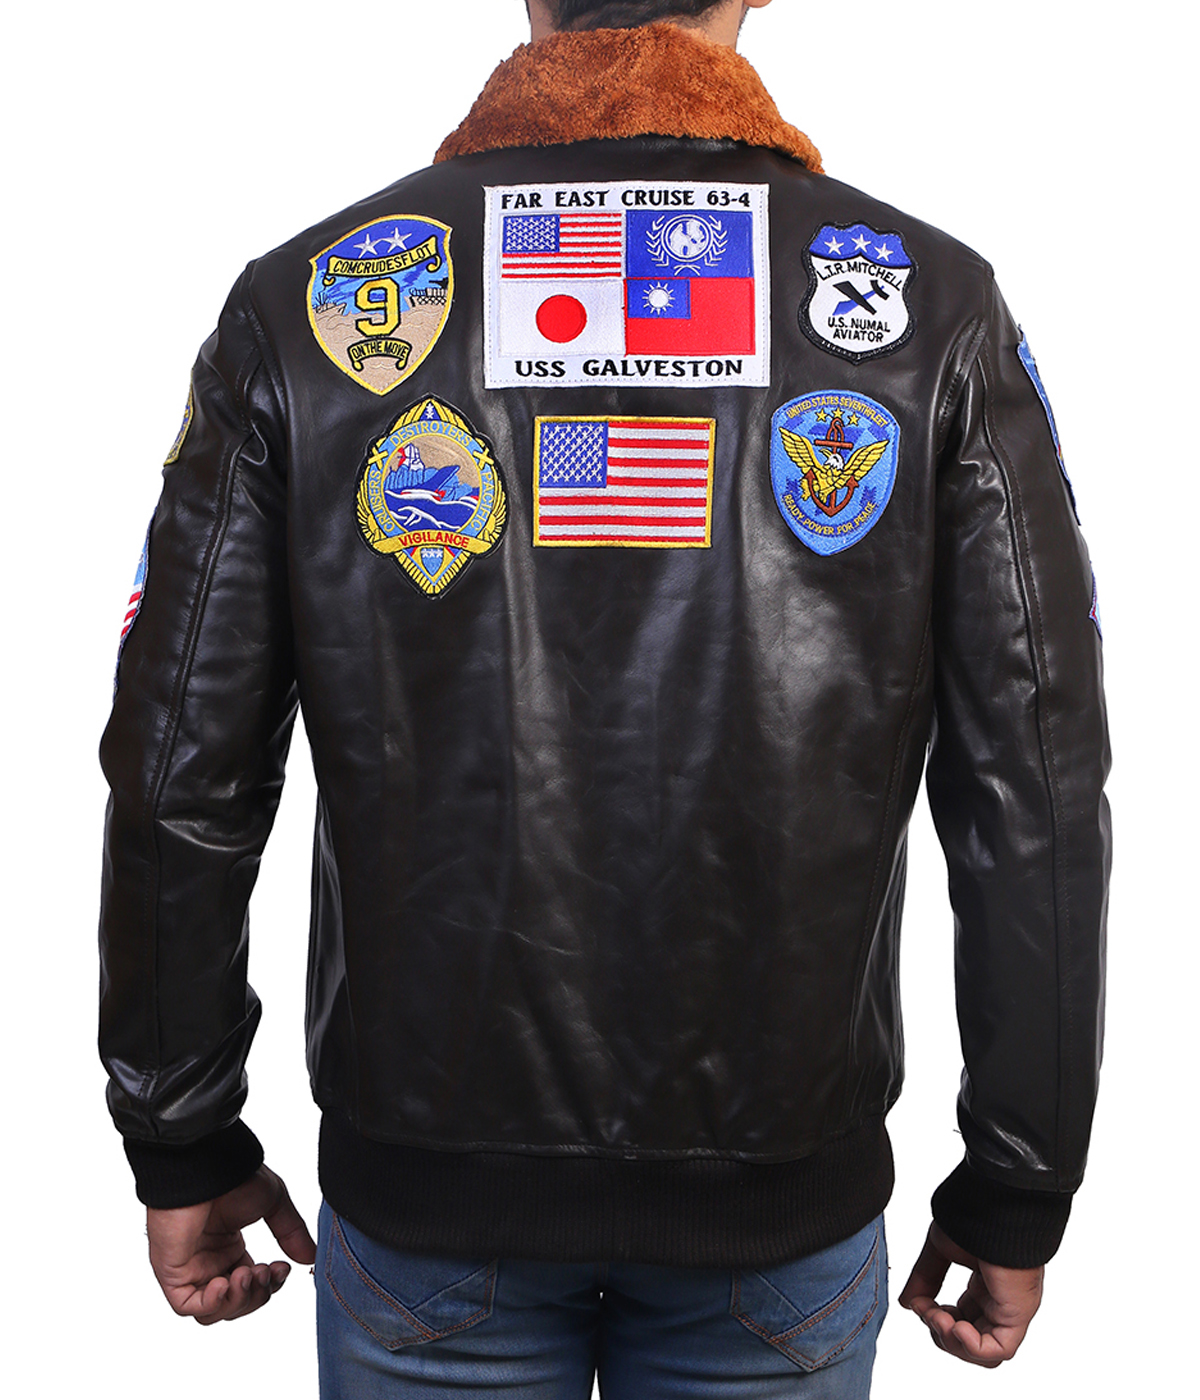 top gun leather jacket back